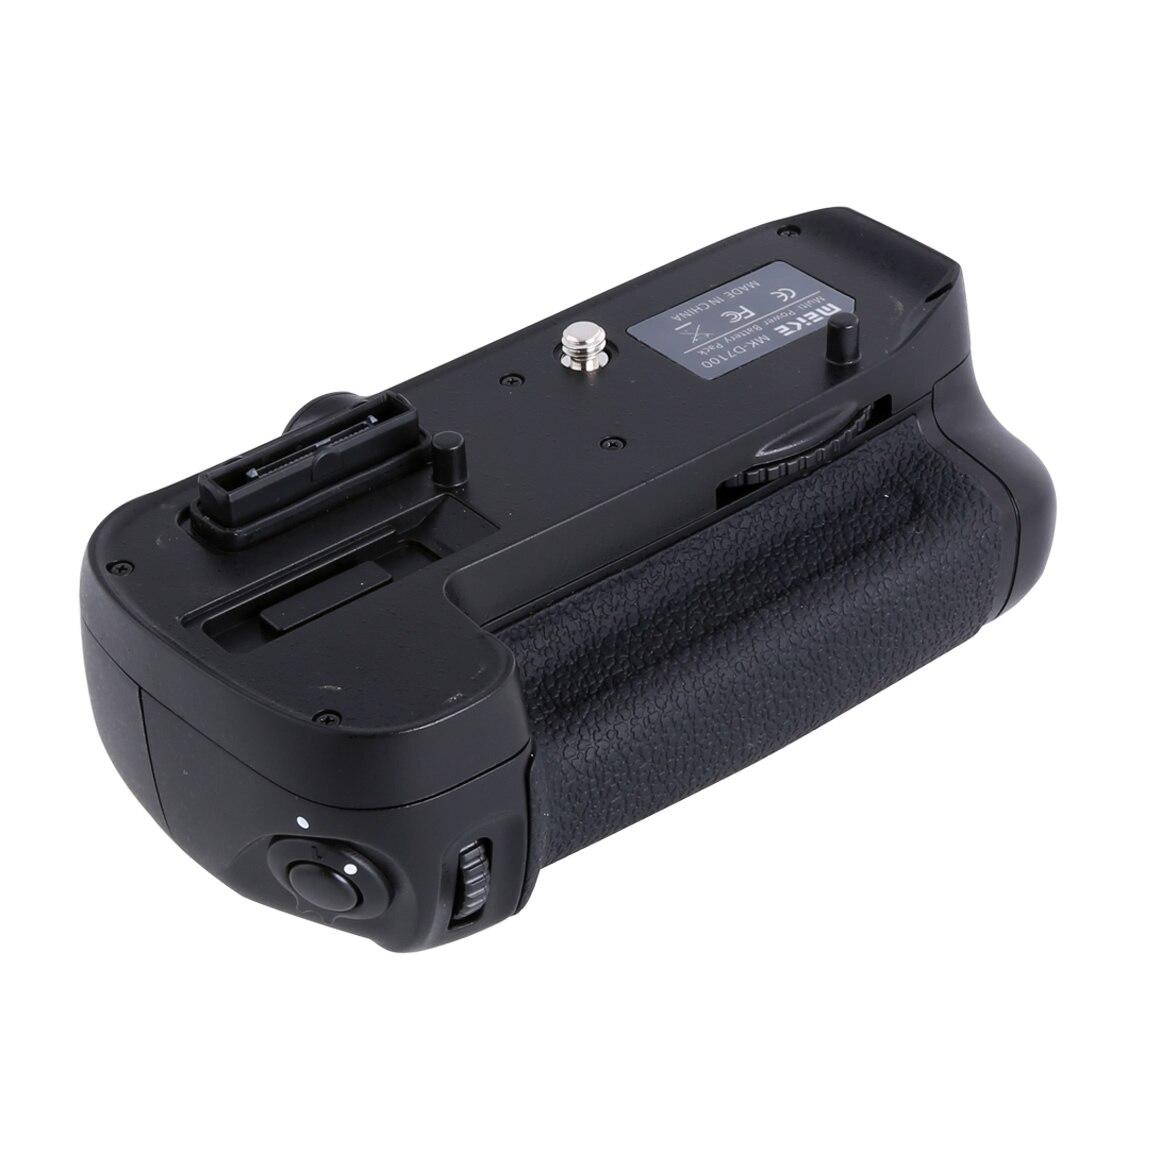 Meike MK D7100 Vertical Battery Grip For Nikon D7100 / D7200 Camera Replace MB D15 as EN EL15